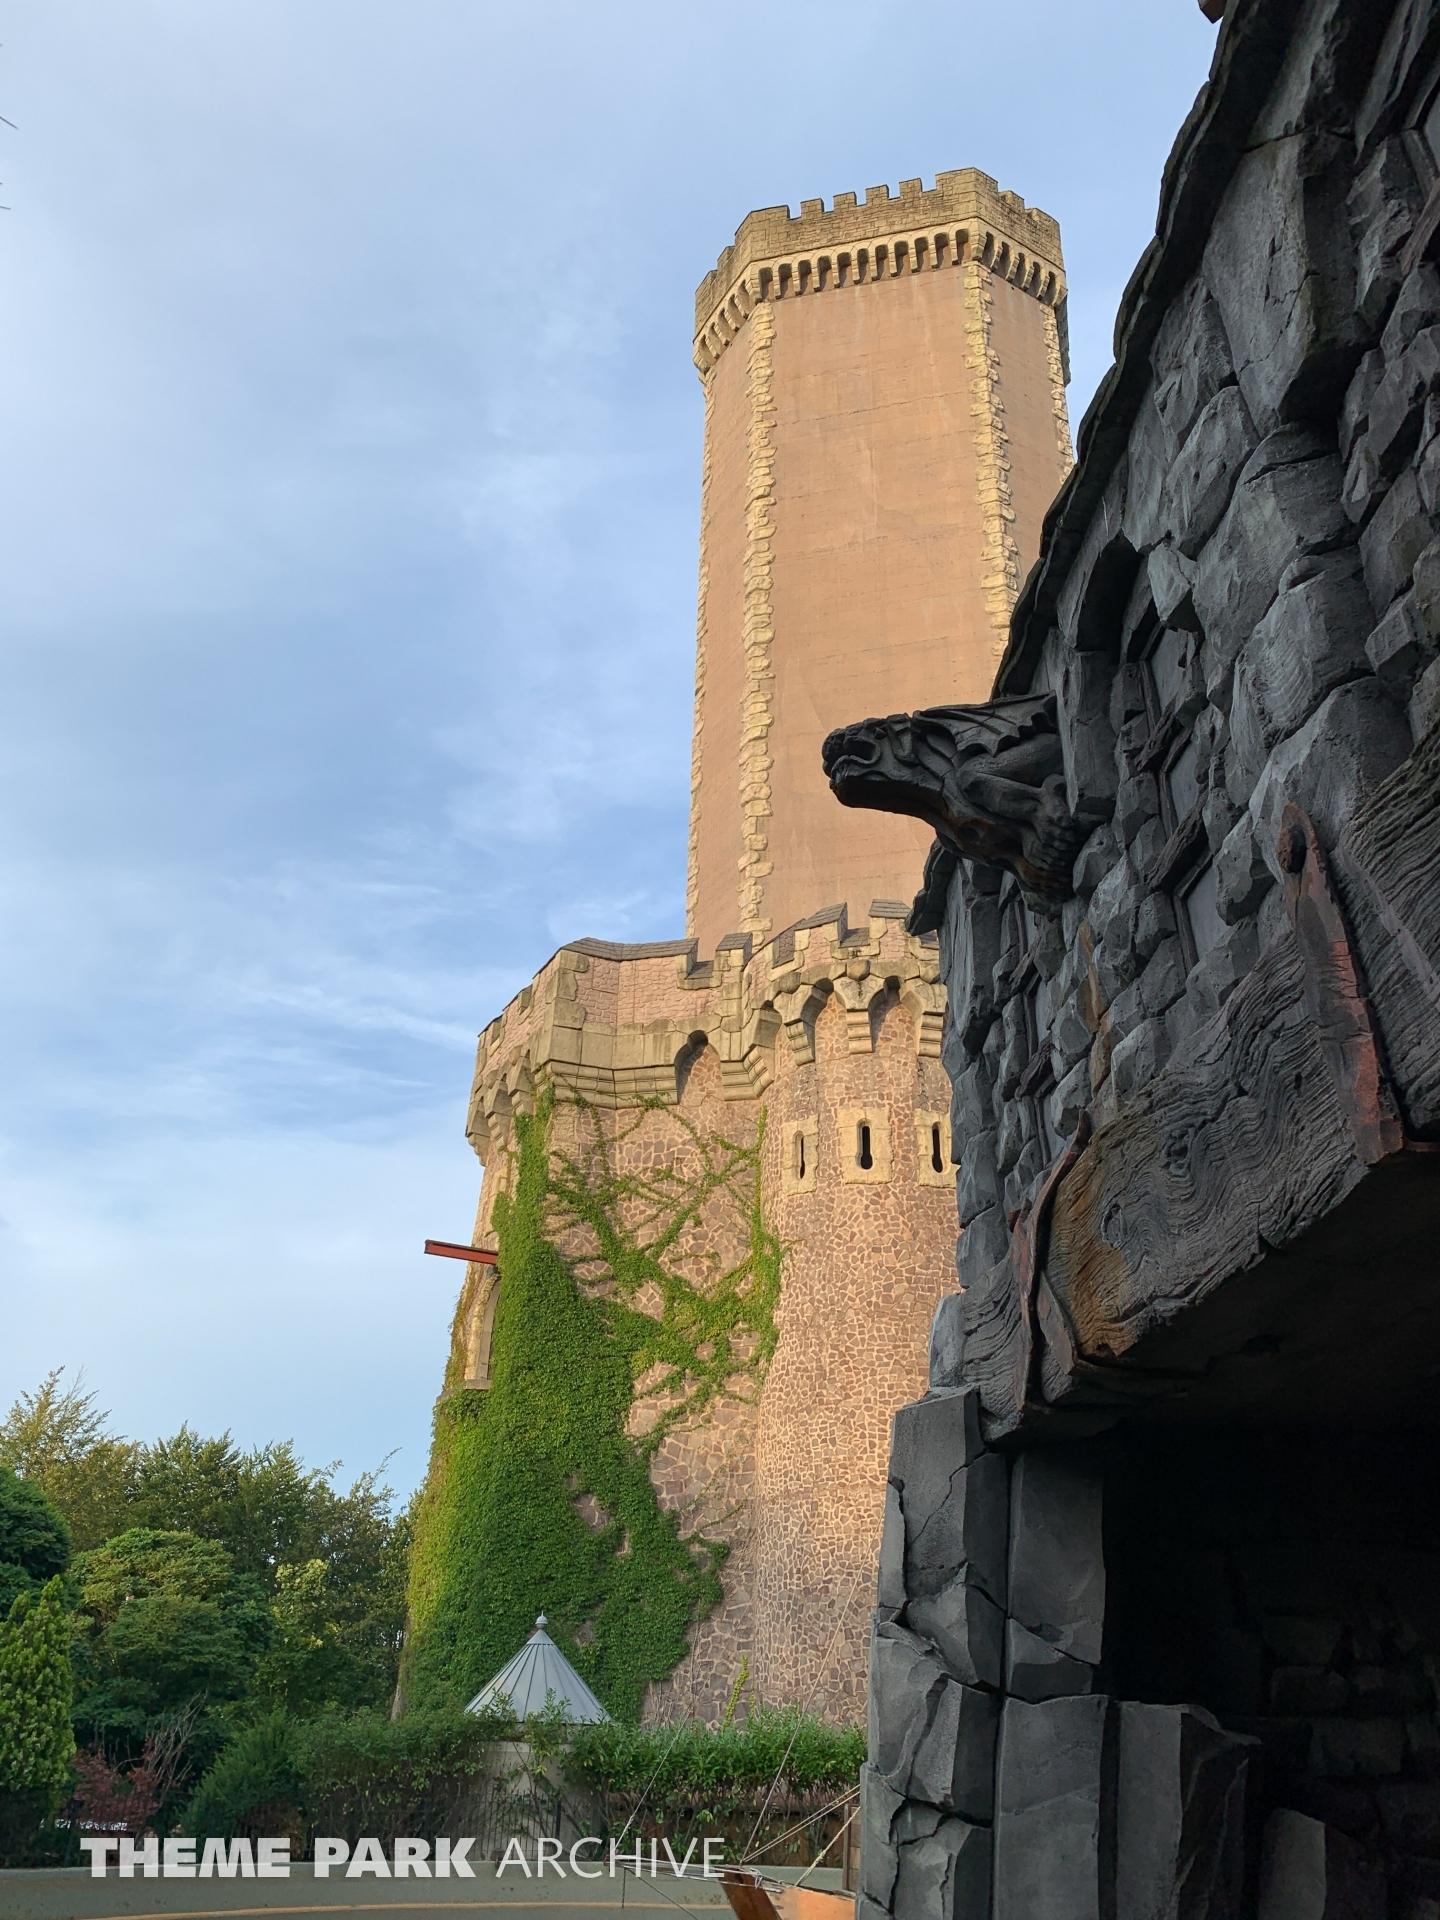 Mystery Castle at Phantasialand